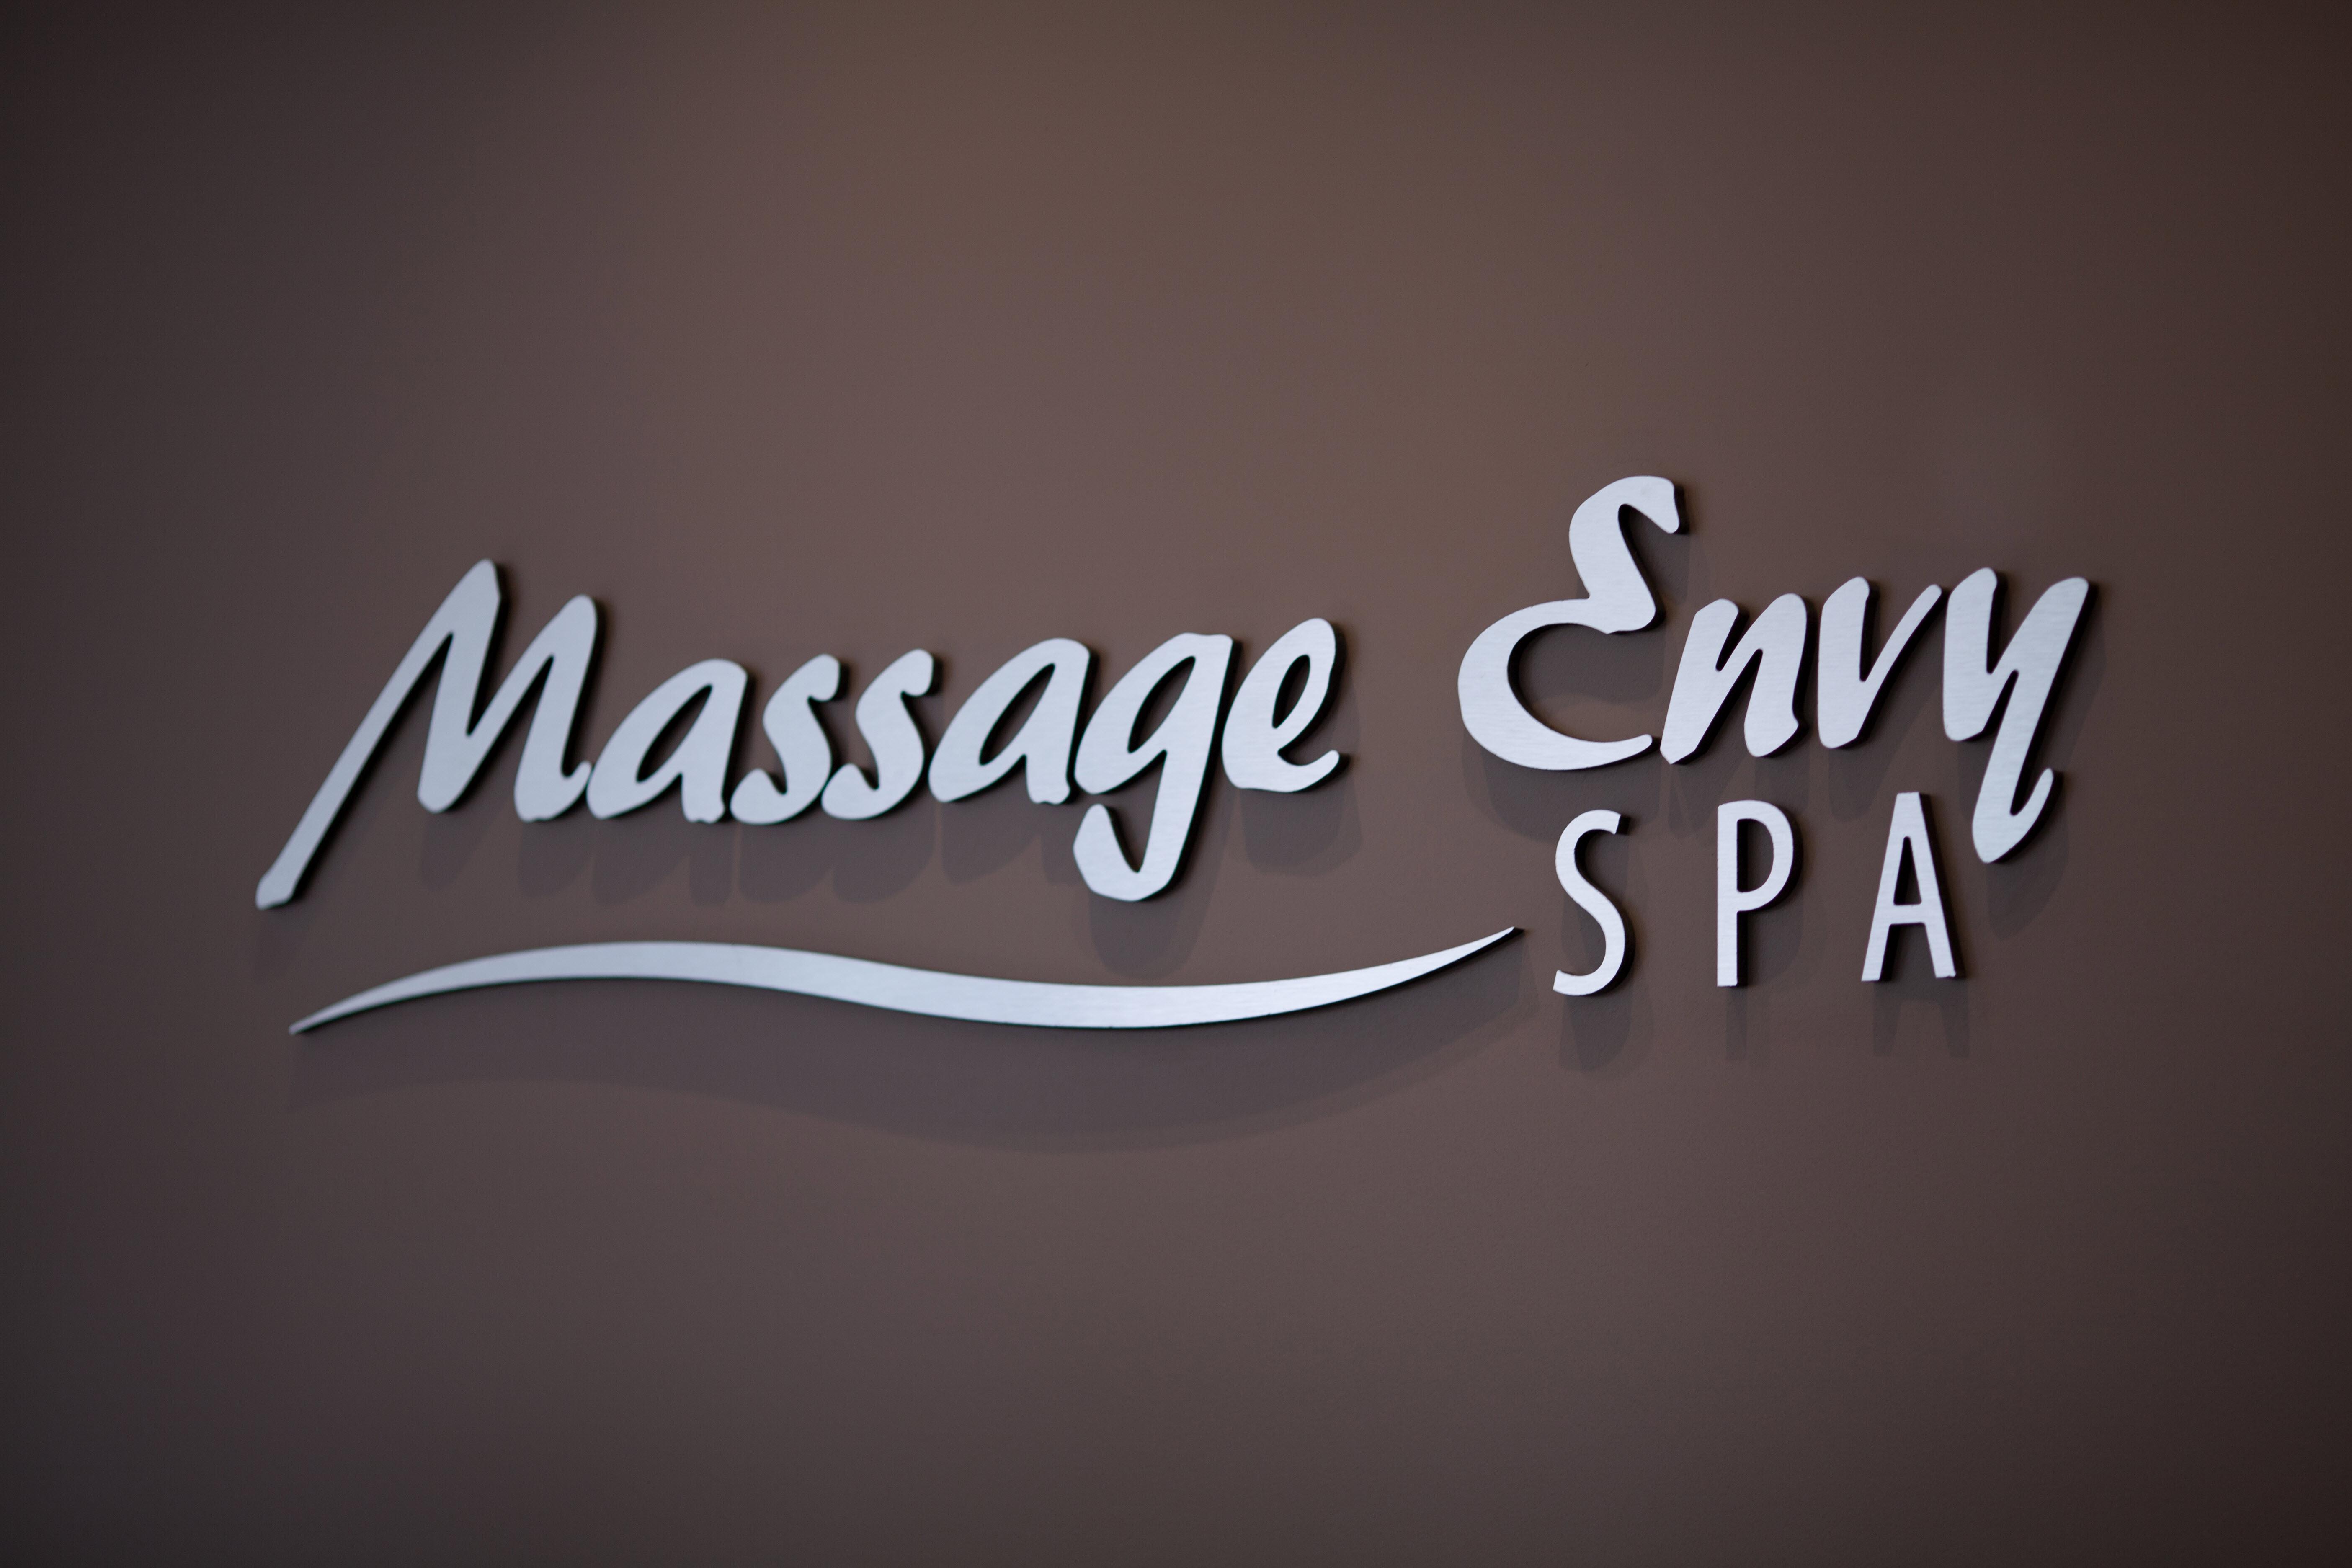 Massage Envy Spa - Duke Street - Foxchase Shoppes